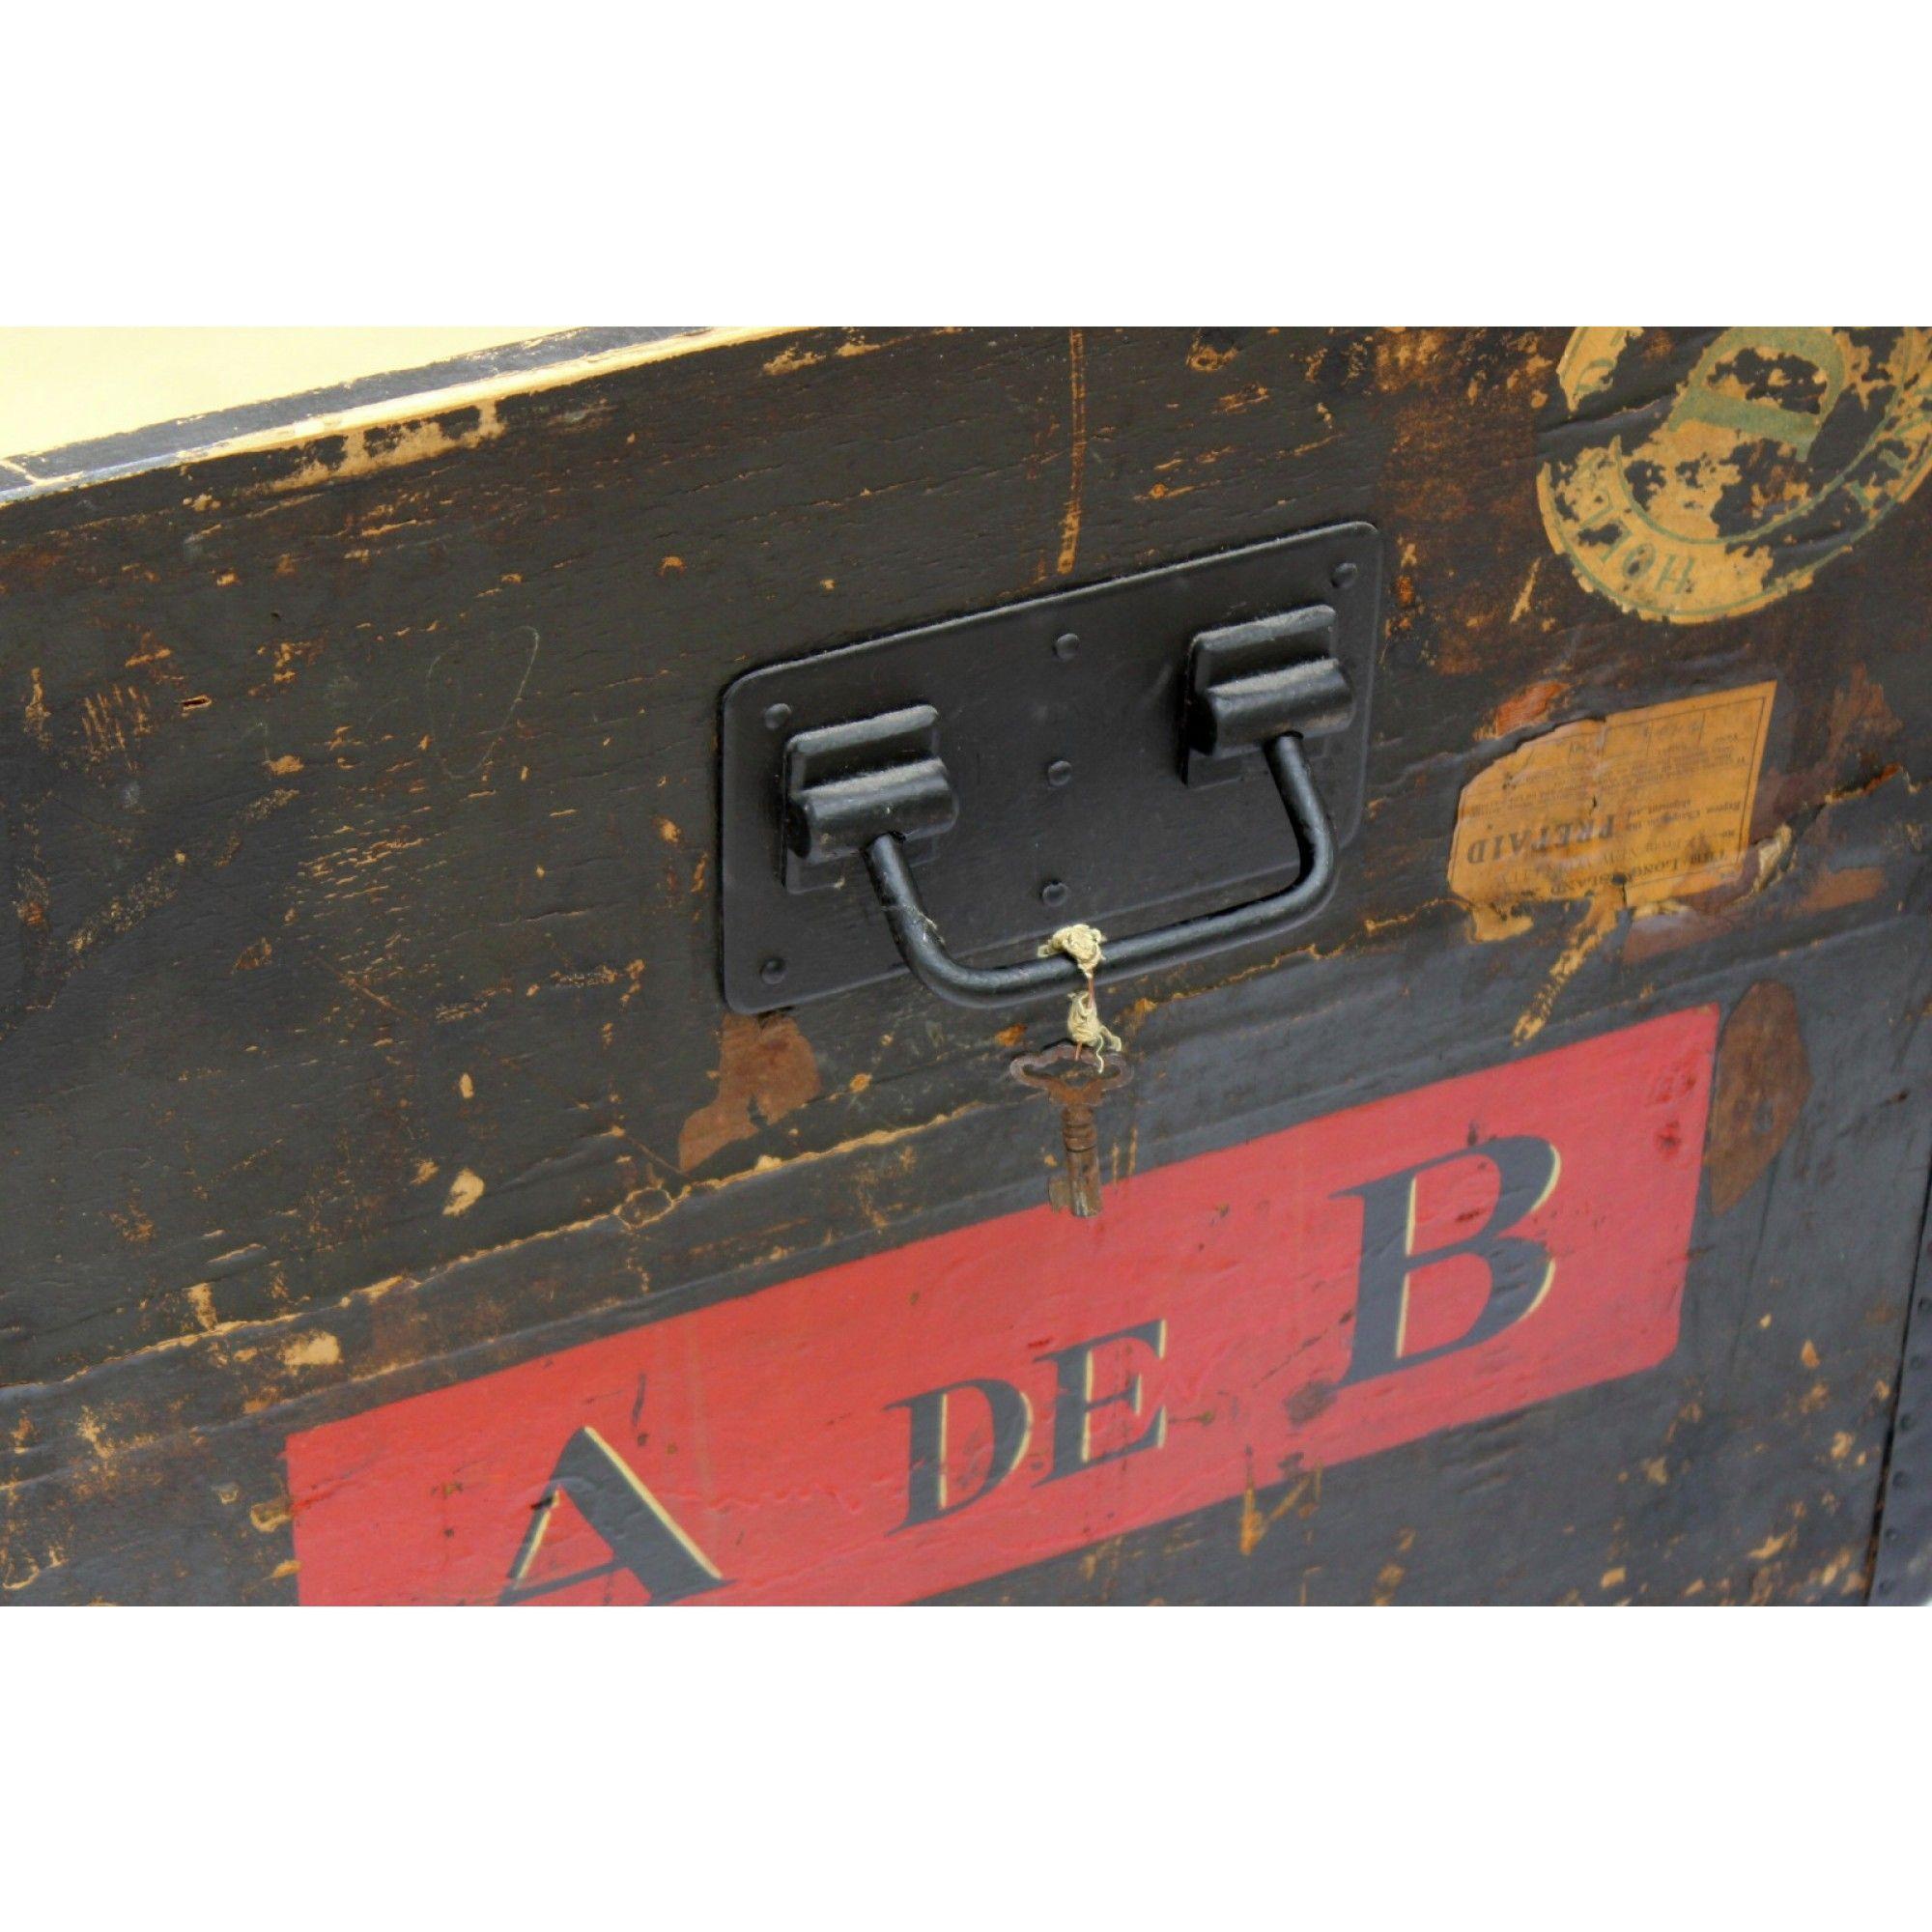 Louis Vuitton Courier Trunk with A DE B initials - Louis Vuitton ...